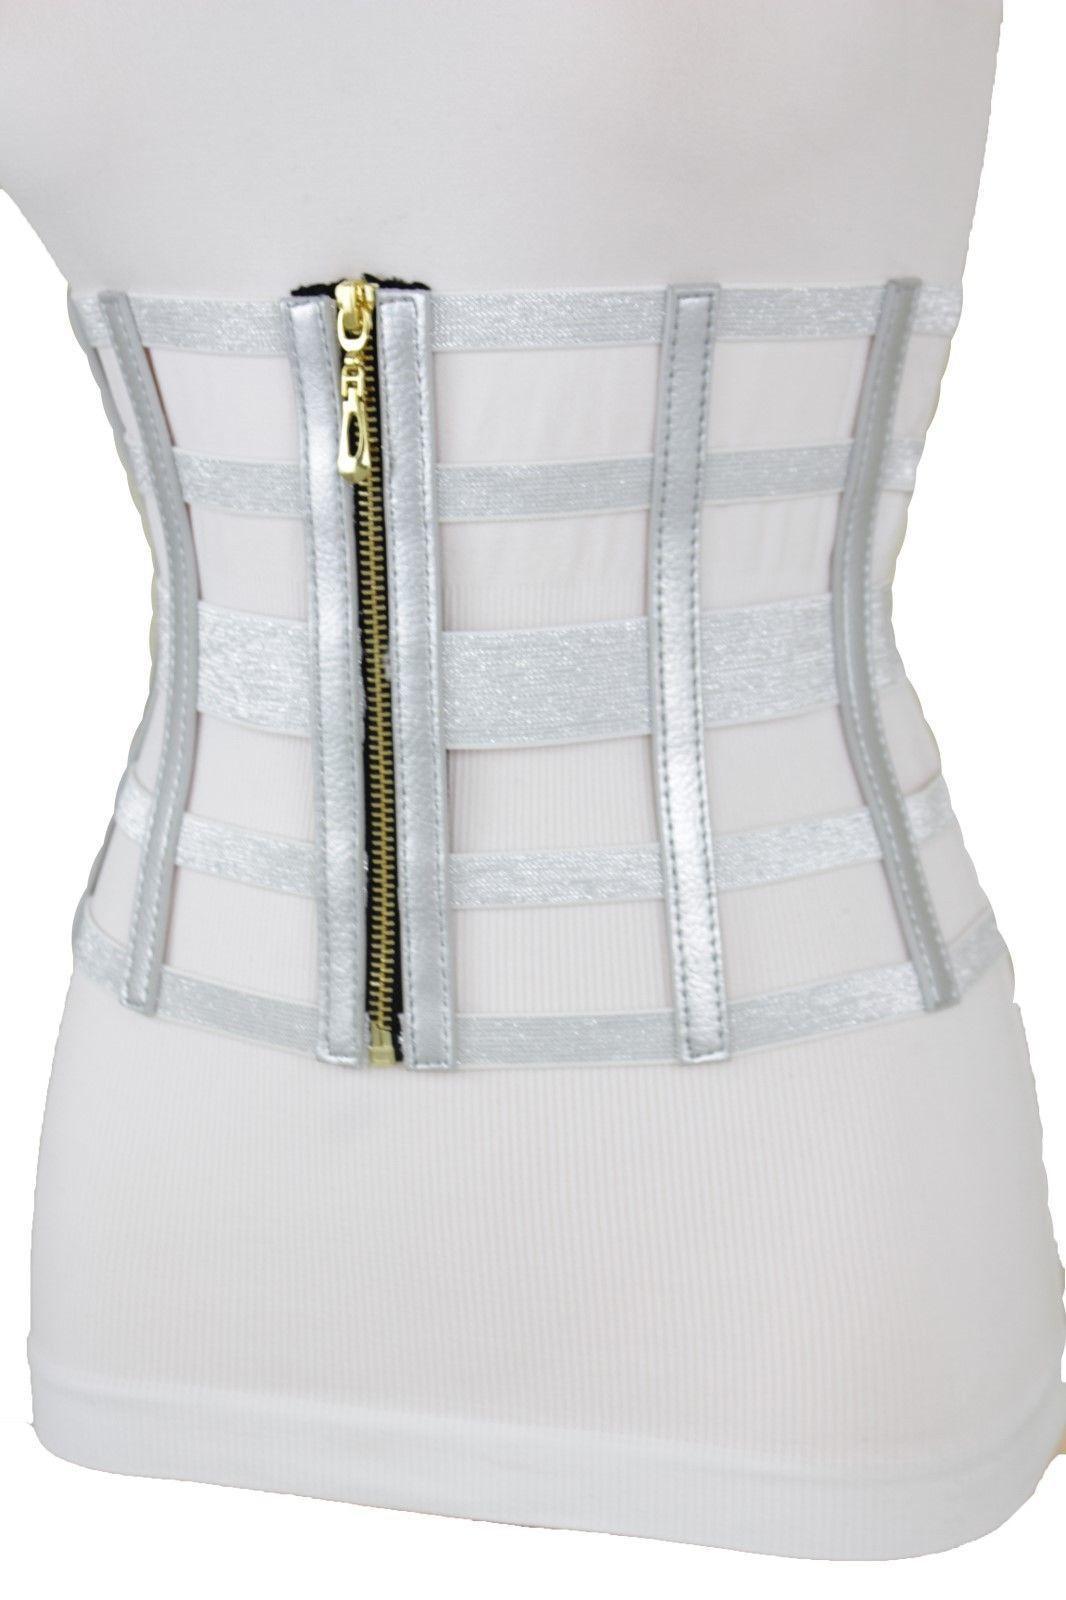 Damen Breit Silber West Elastisch Korsett Gürtel Hohe Taille Gold Reißverschluss